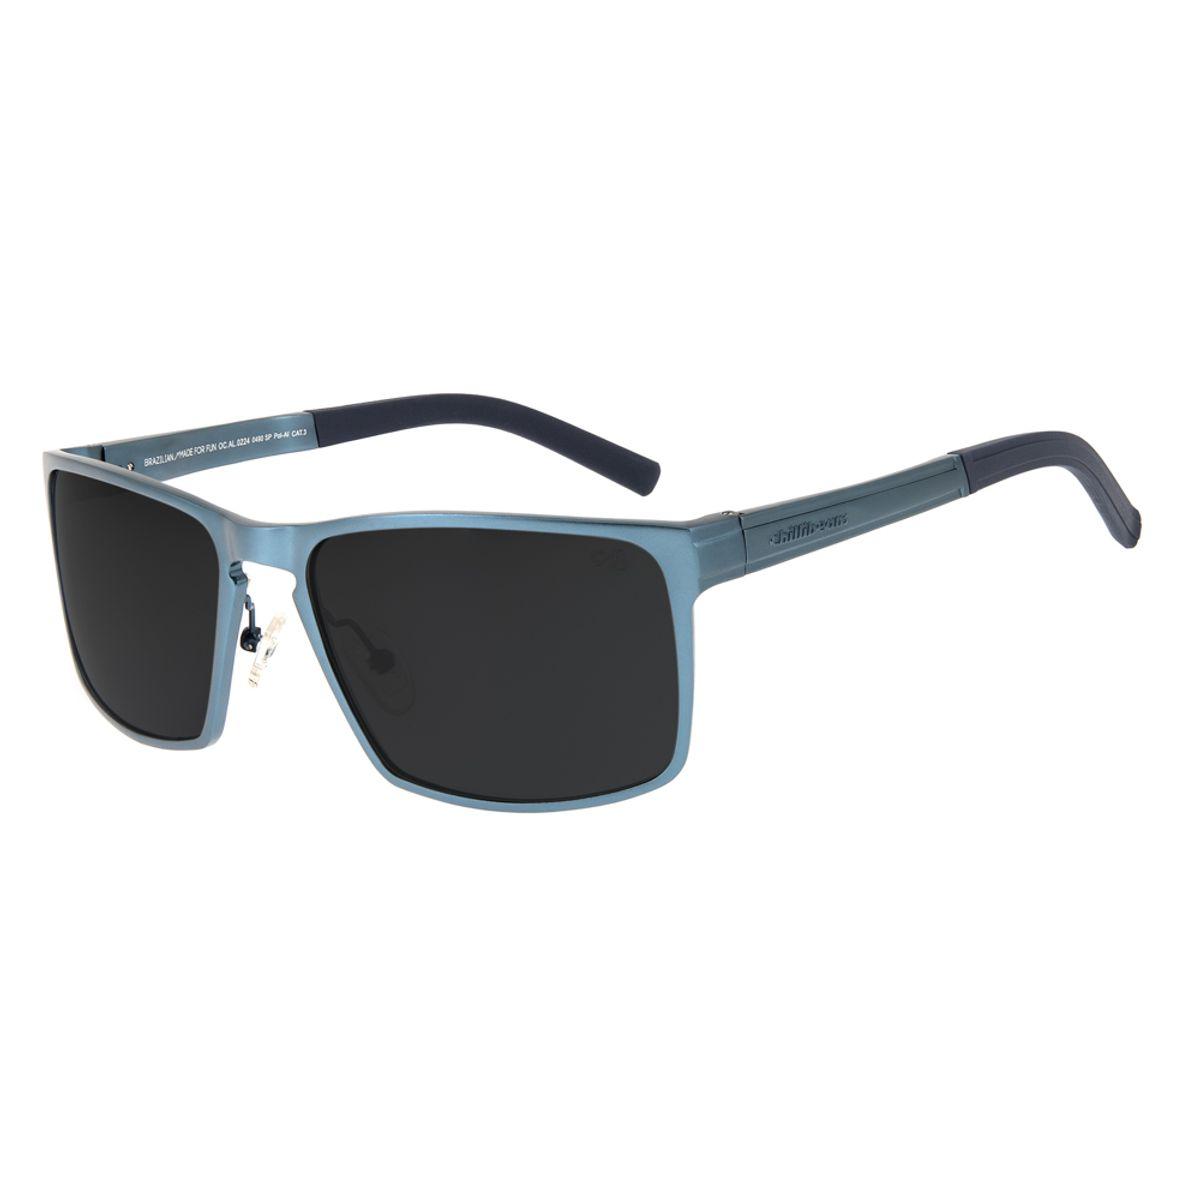 27301ca41e9c0 Óculos de Sol Chilli Beans Masculino Sport Polarizado Azul Escuro ...